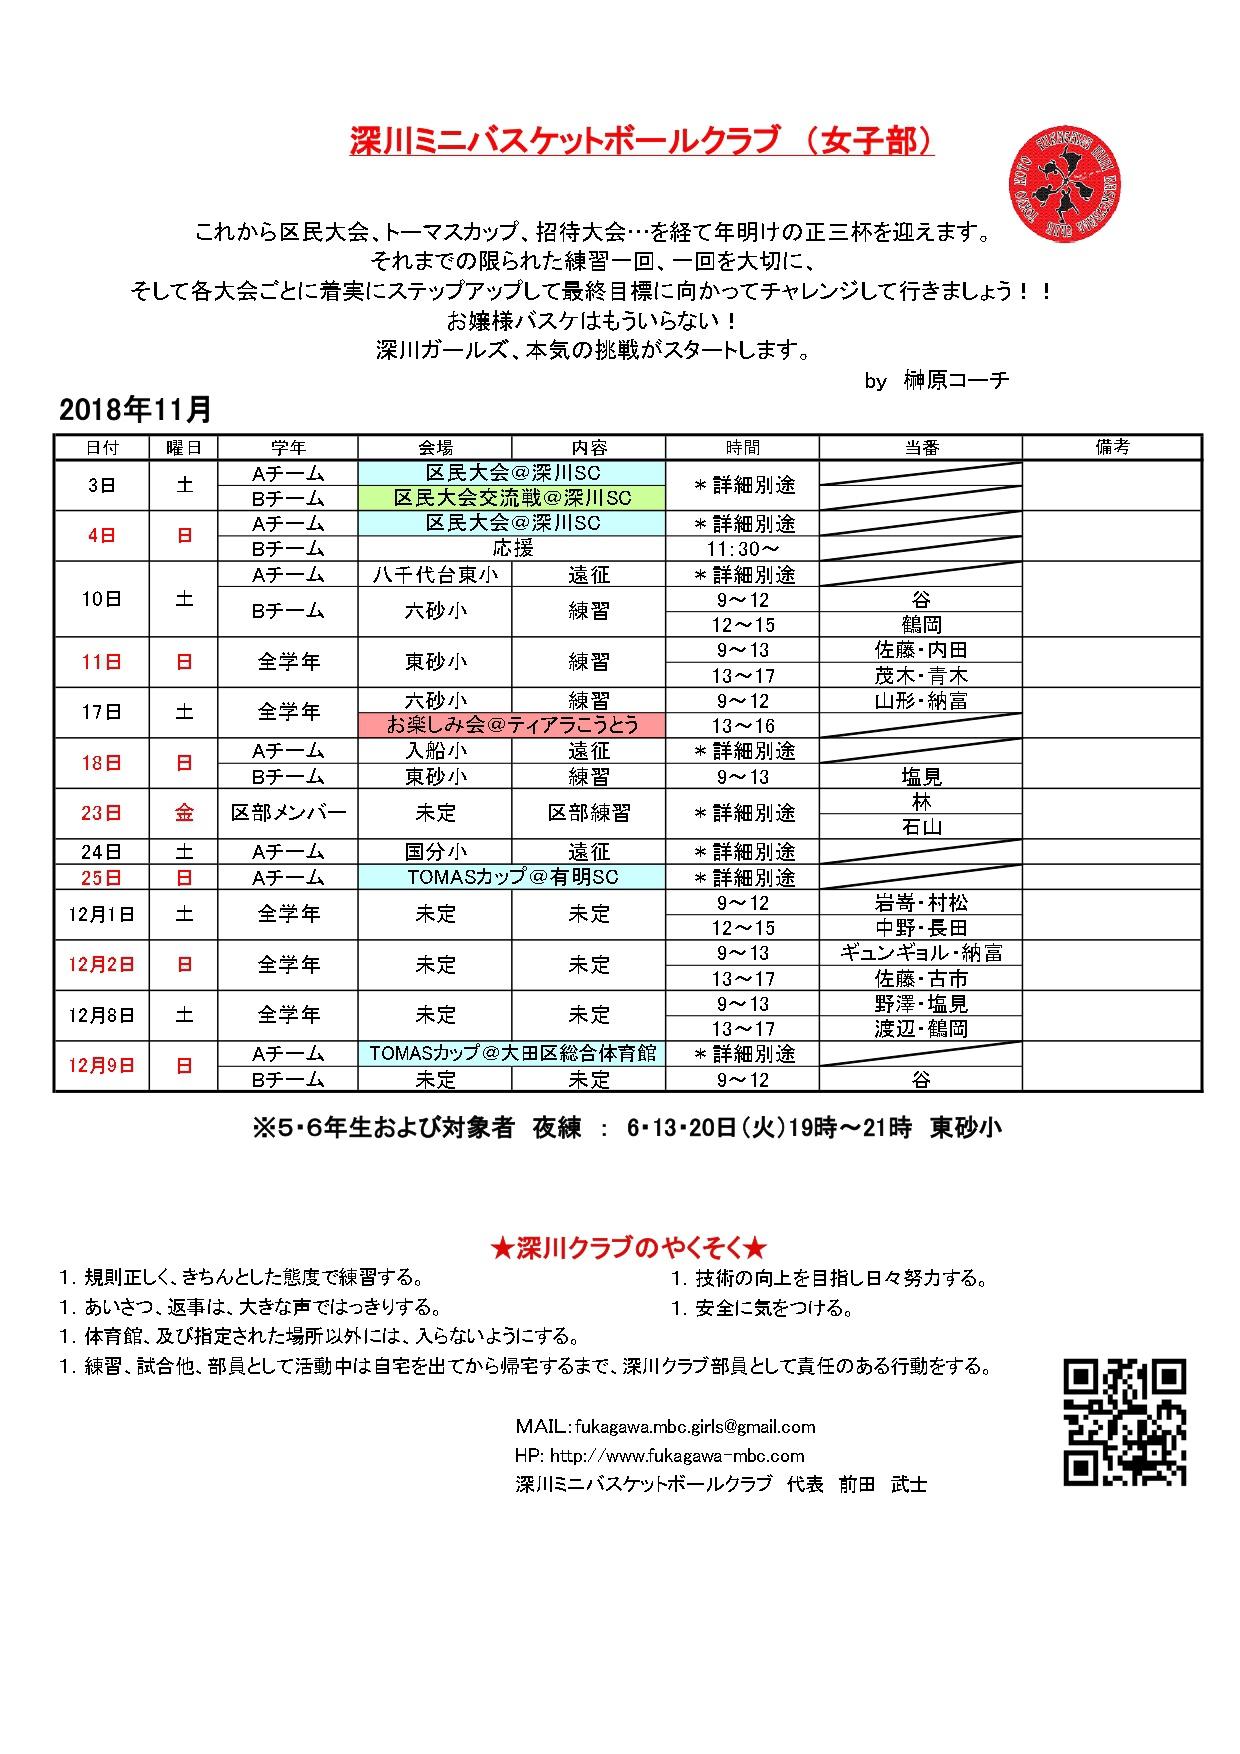 8FC09BF5-E83C-408E-A194-4FD9378A6859